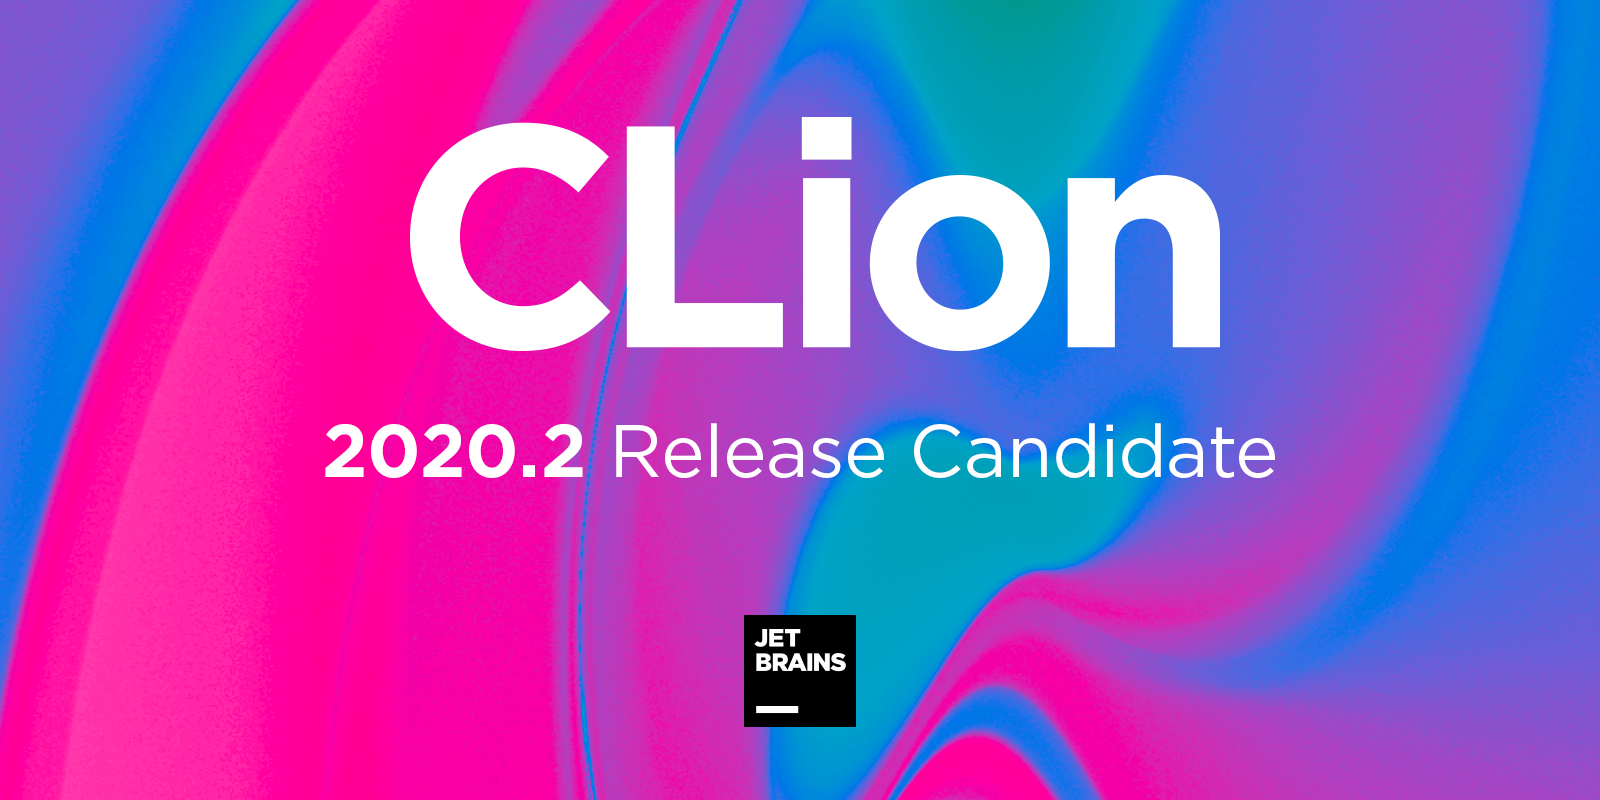 CLion 2020.2 release